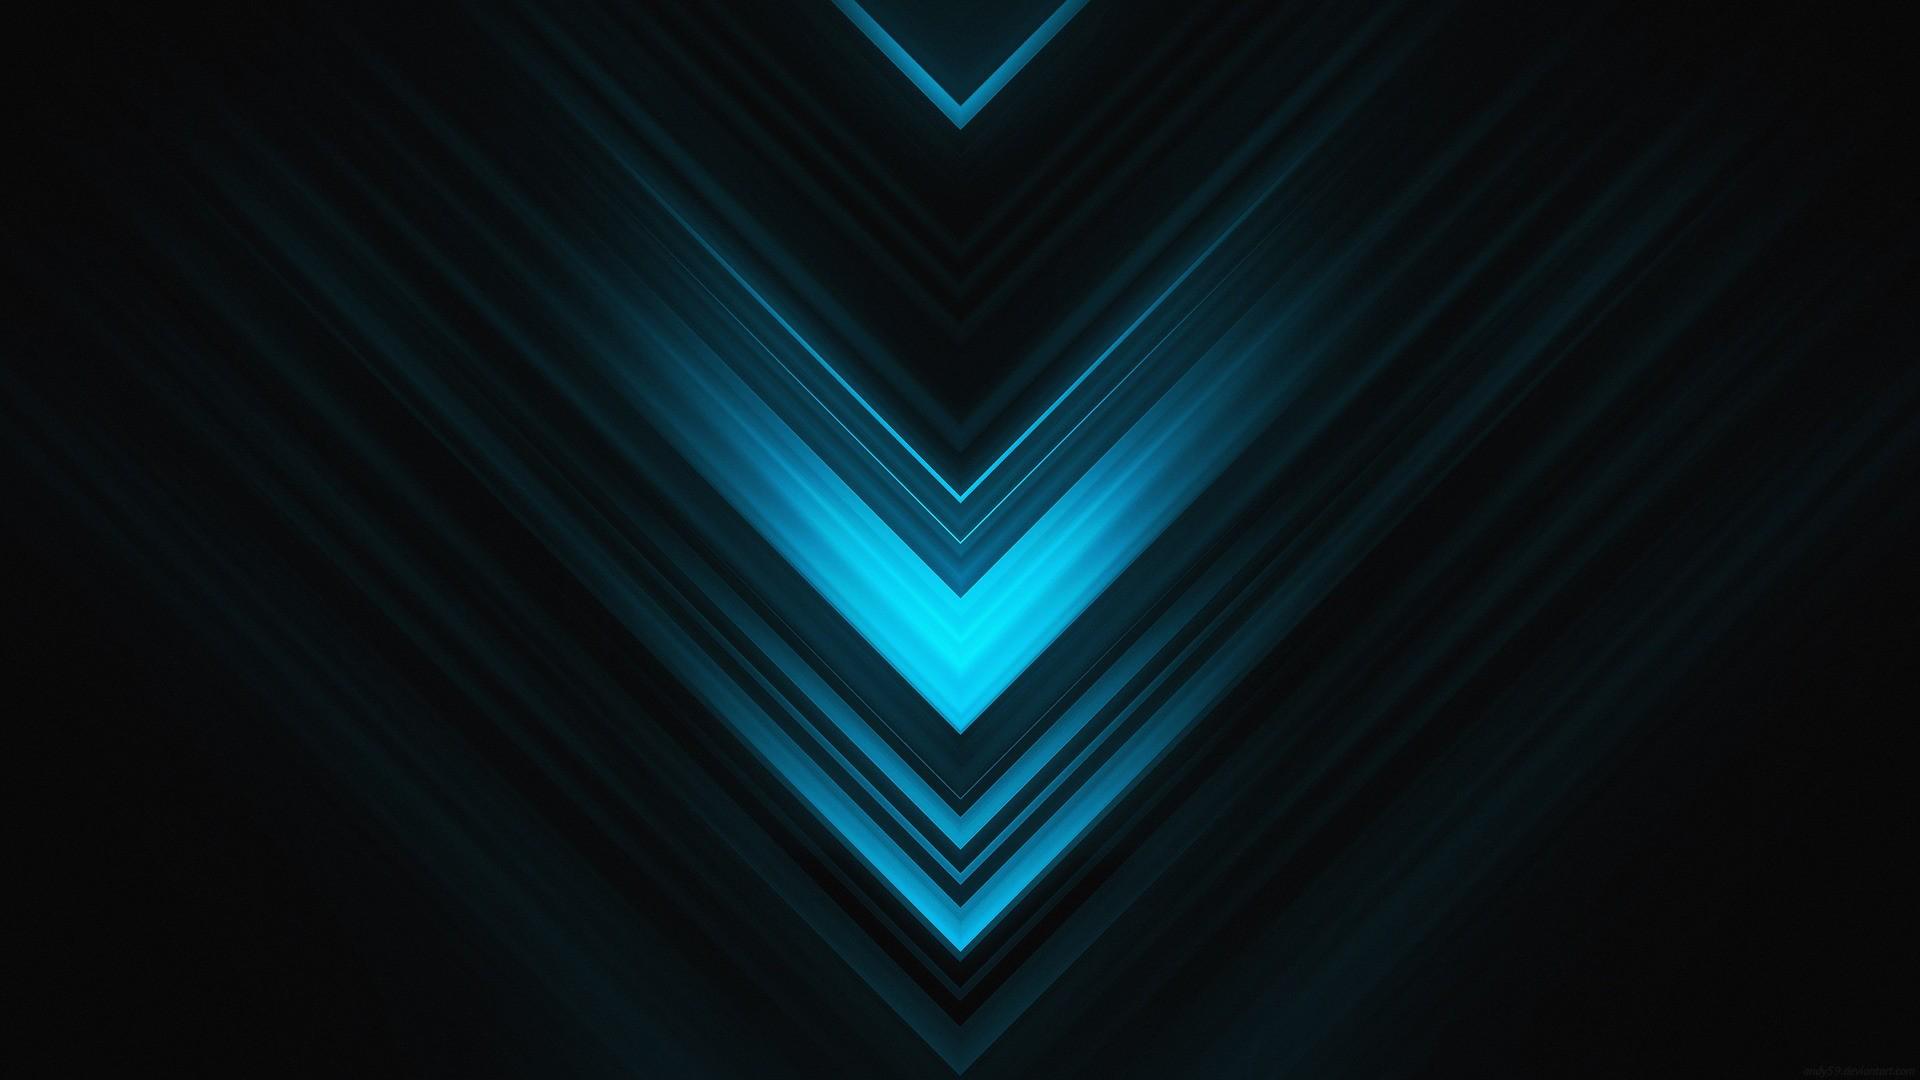 2000 Wallpaper Biru Seni  Gratis